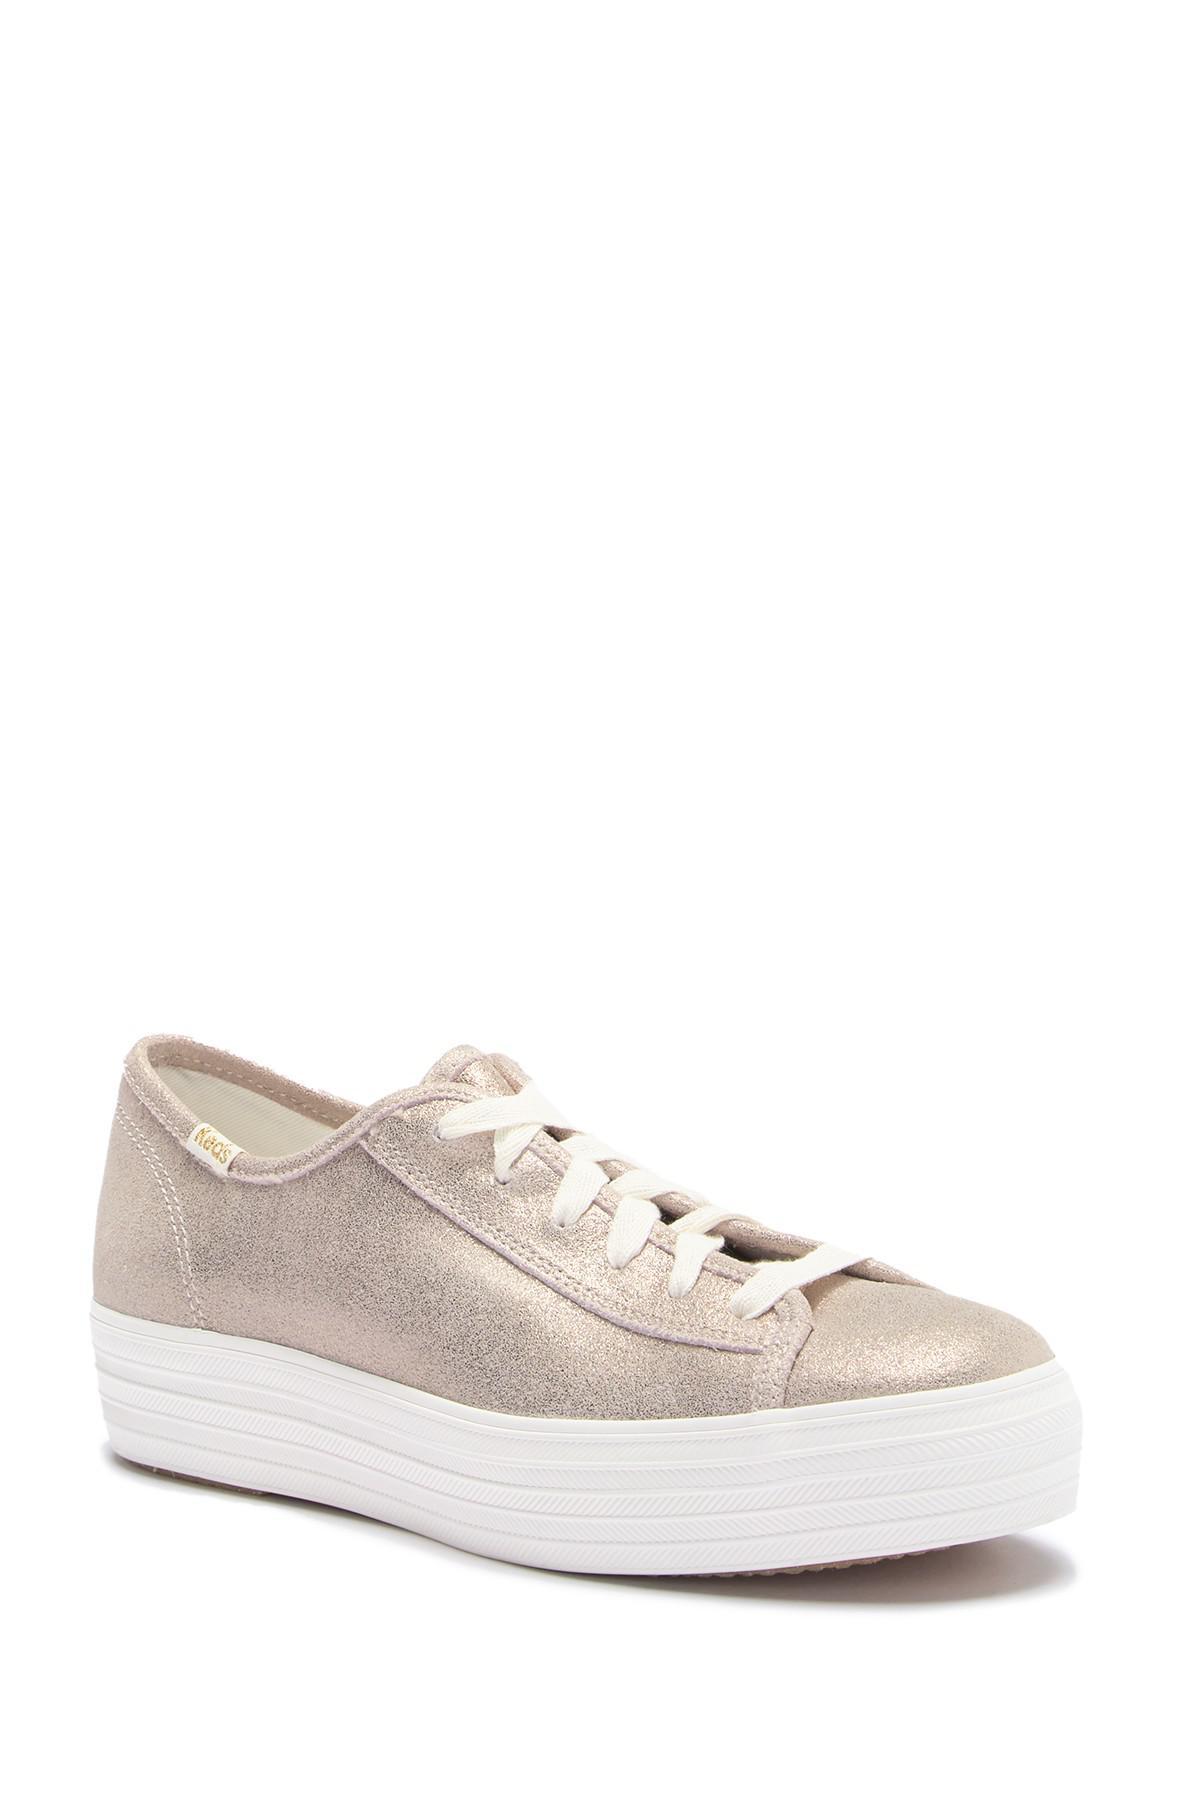 30c3d3083712 Lyst - Keds Triple Kick Glitter Suede Platform Sneaker - Save 34%